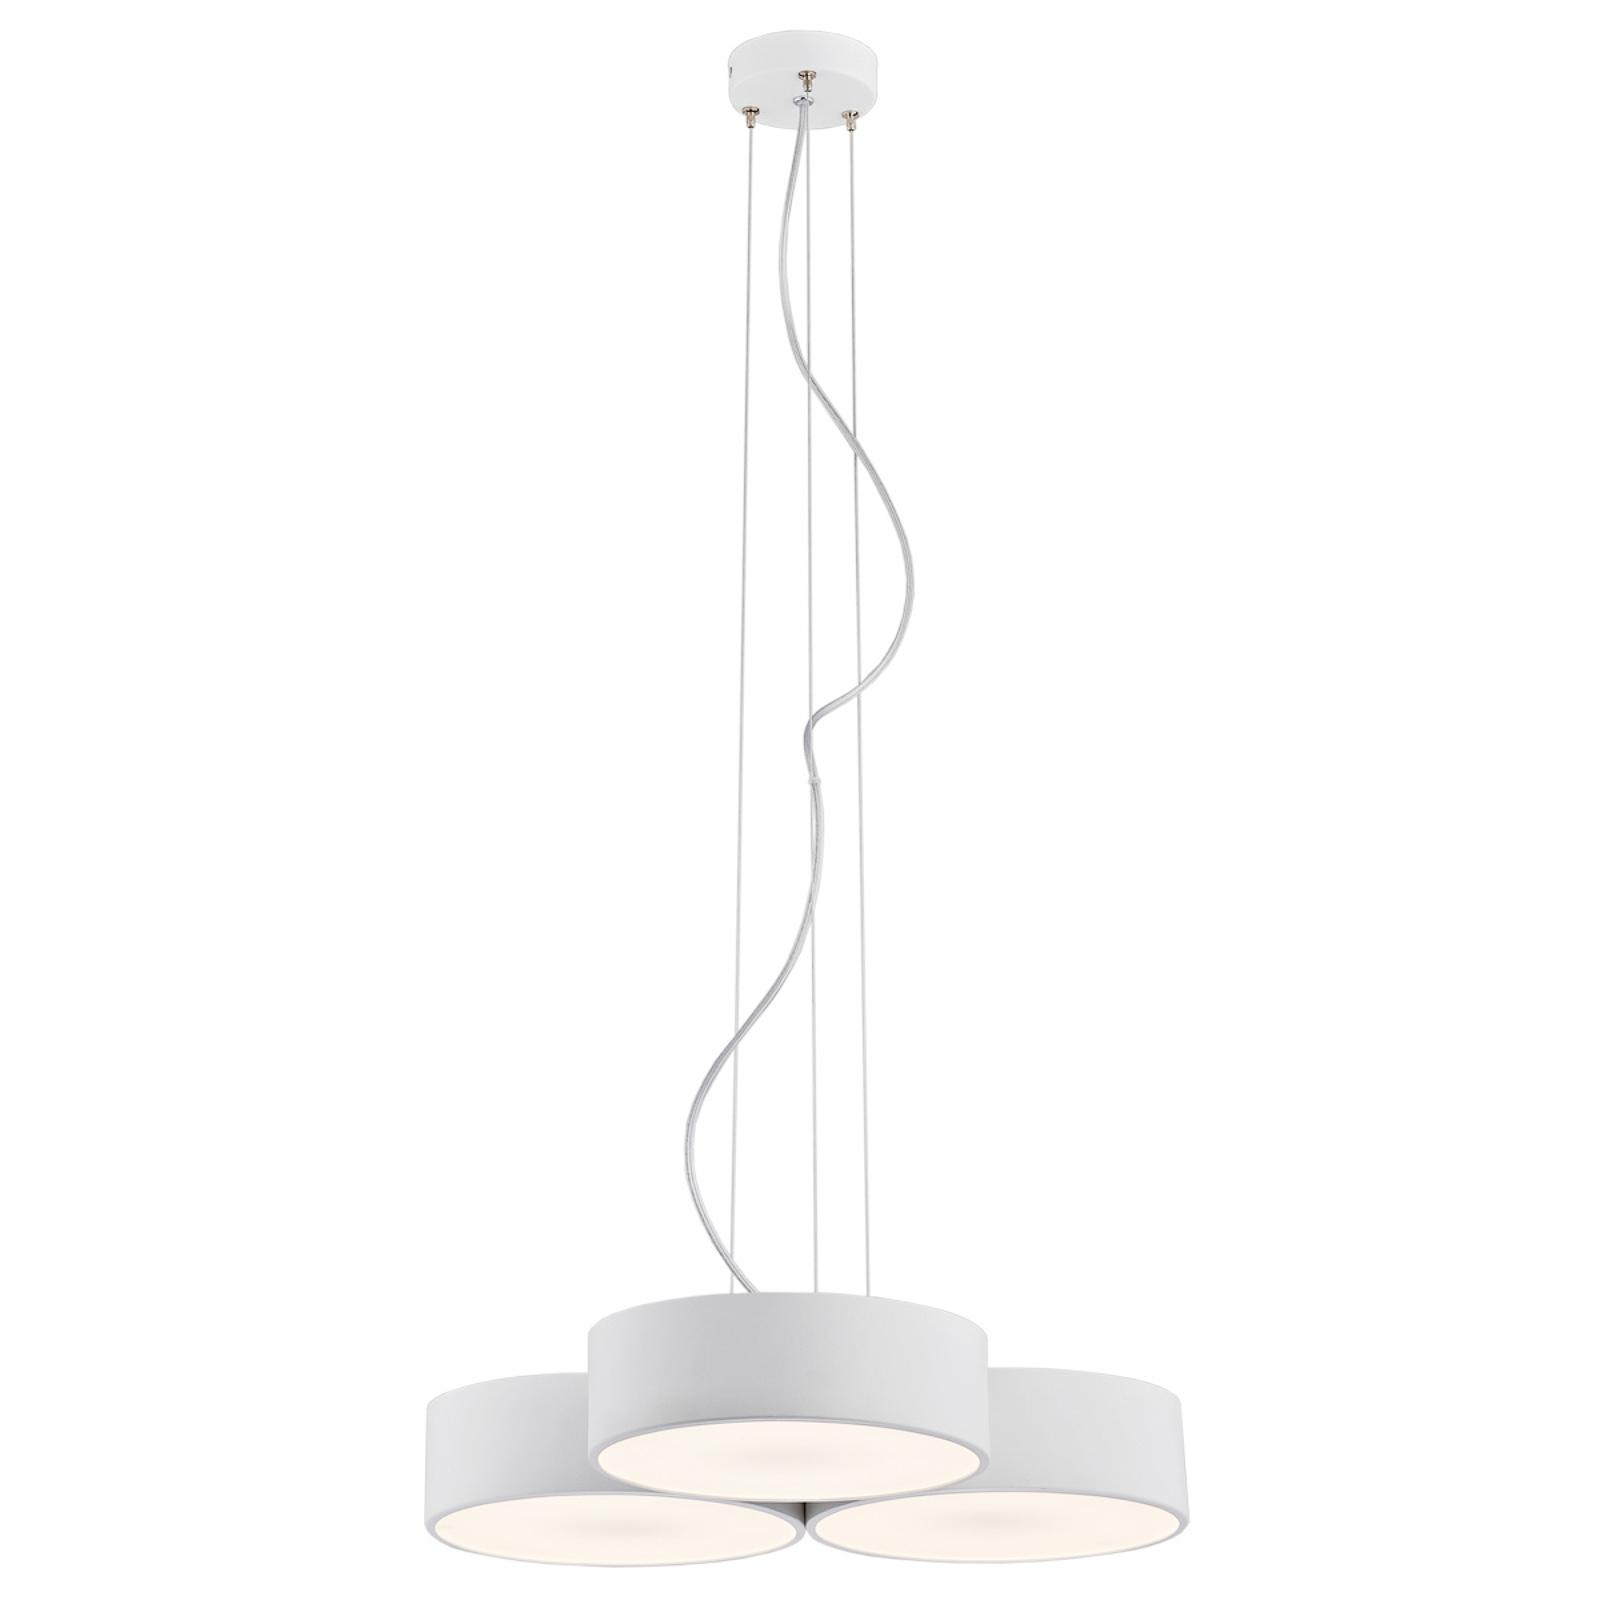 LED-hengelampe Dayton, 3 lyskilder, hvit